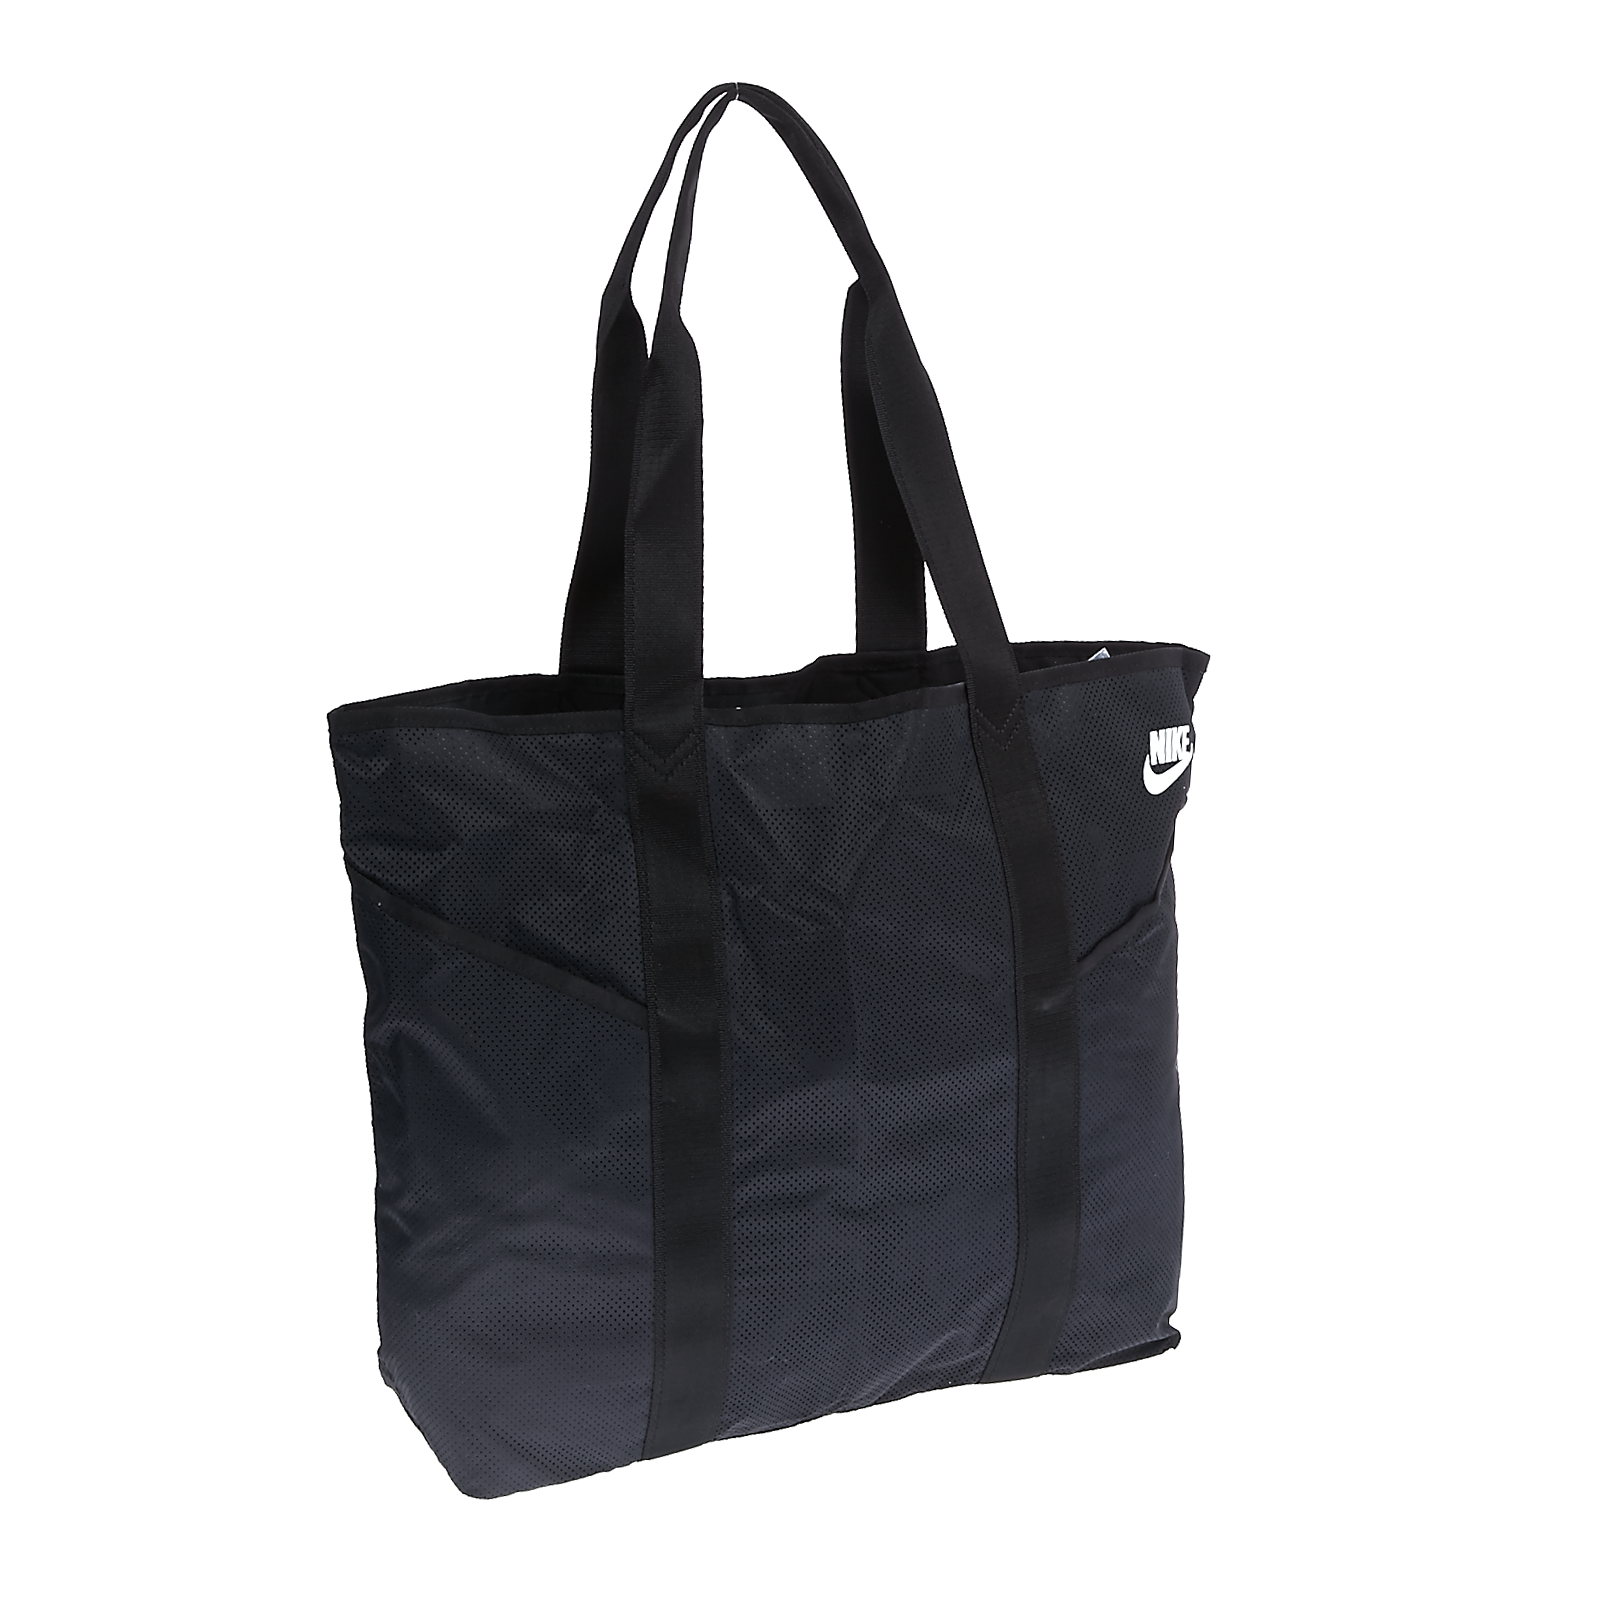 NIKE – Τσάντα NIKE AZEDA μαύρη 1365403.1-0072